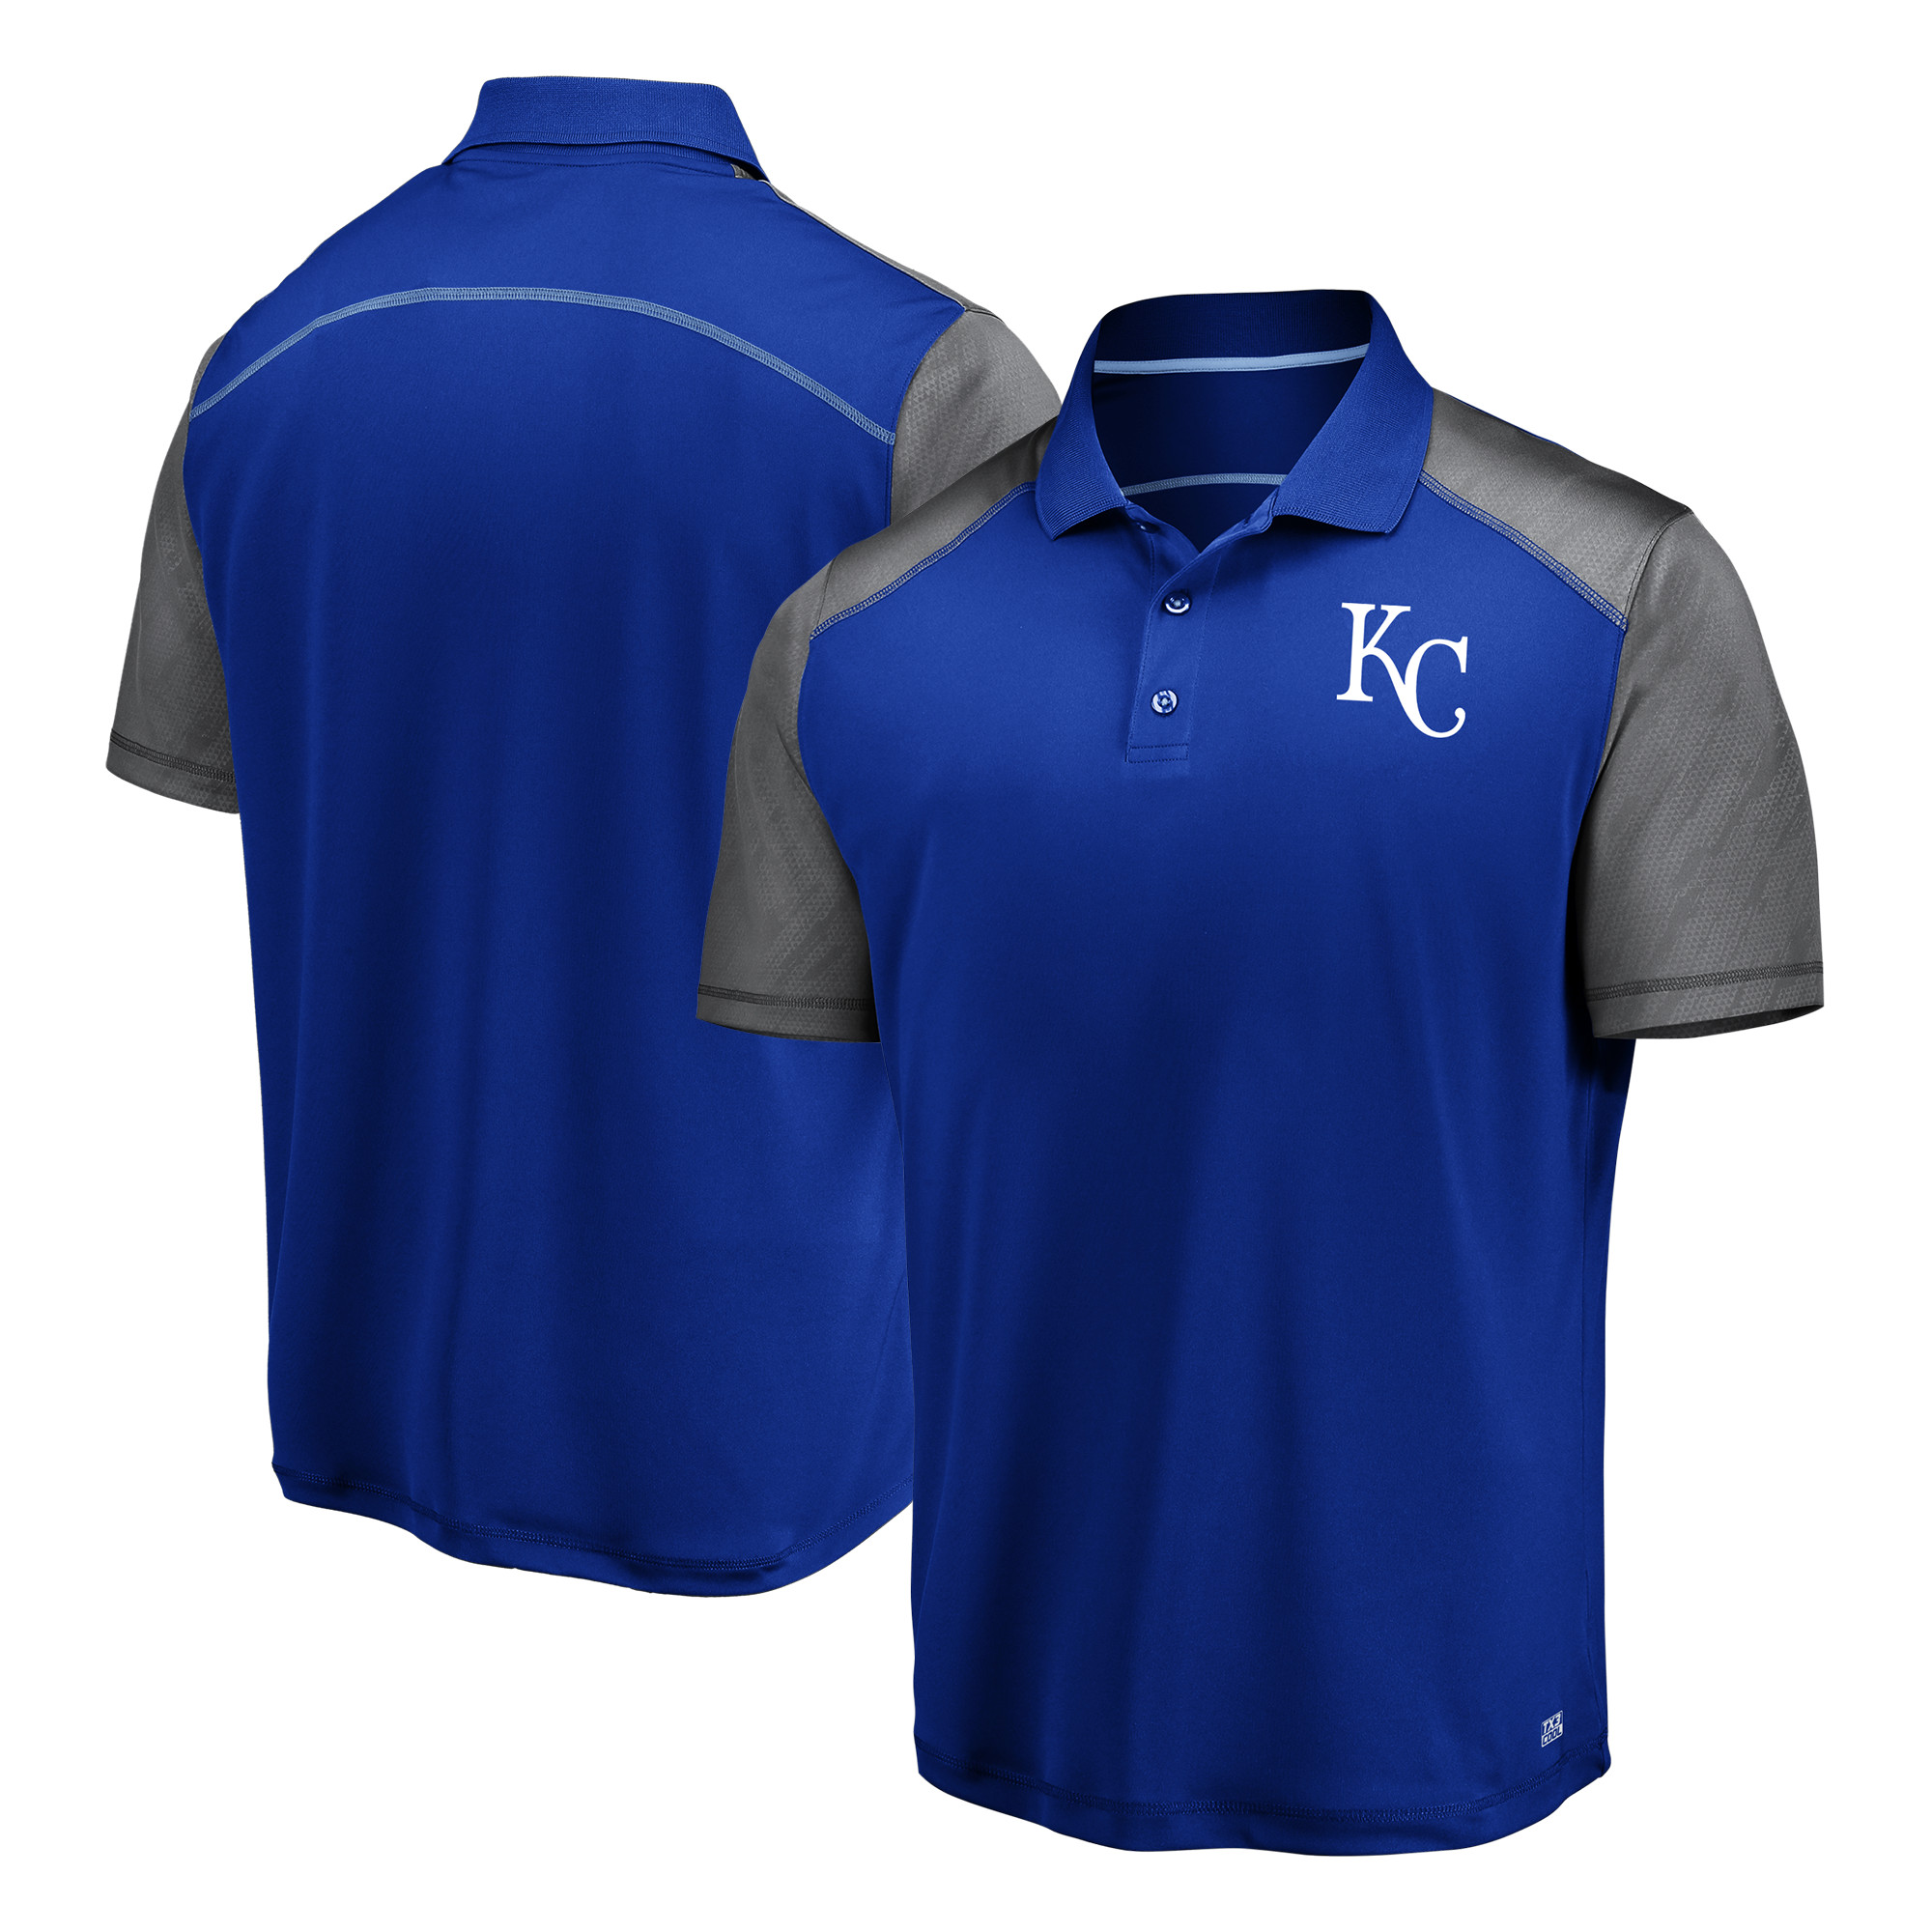 Men's Majestic Royal/Gray Kansas City Royals Cool Base Polo